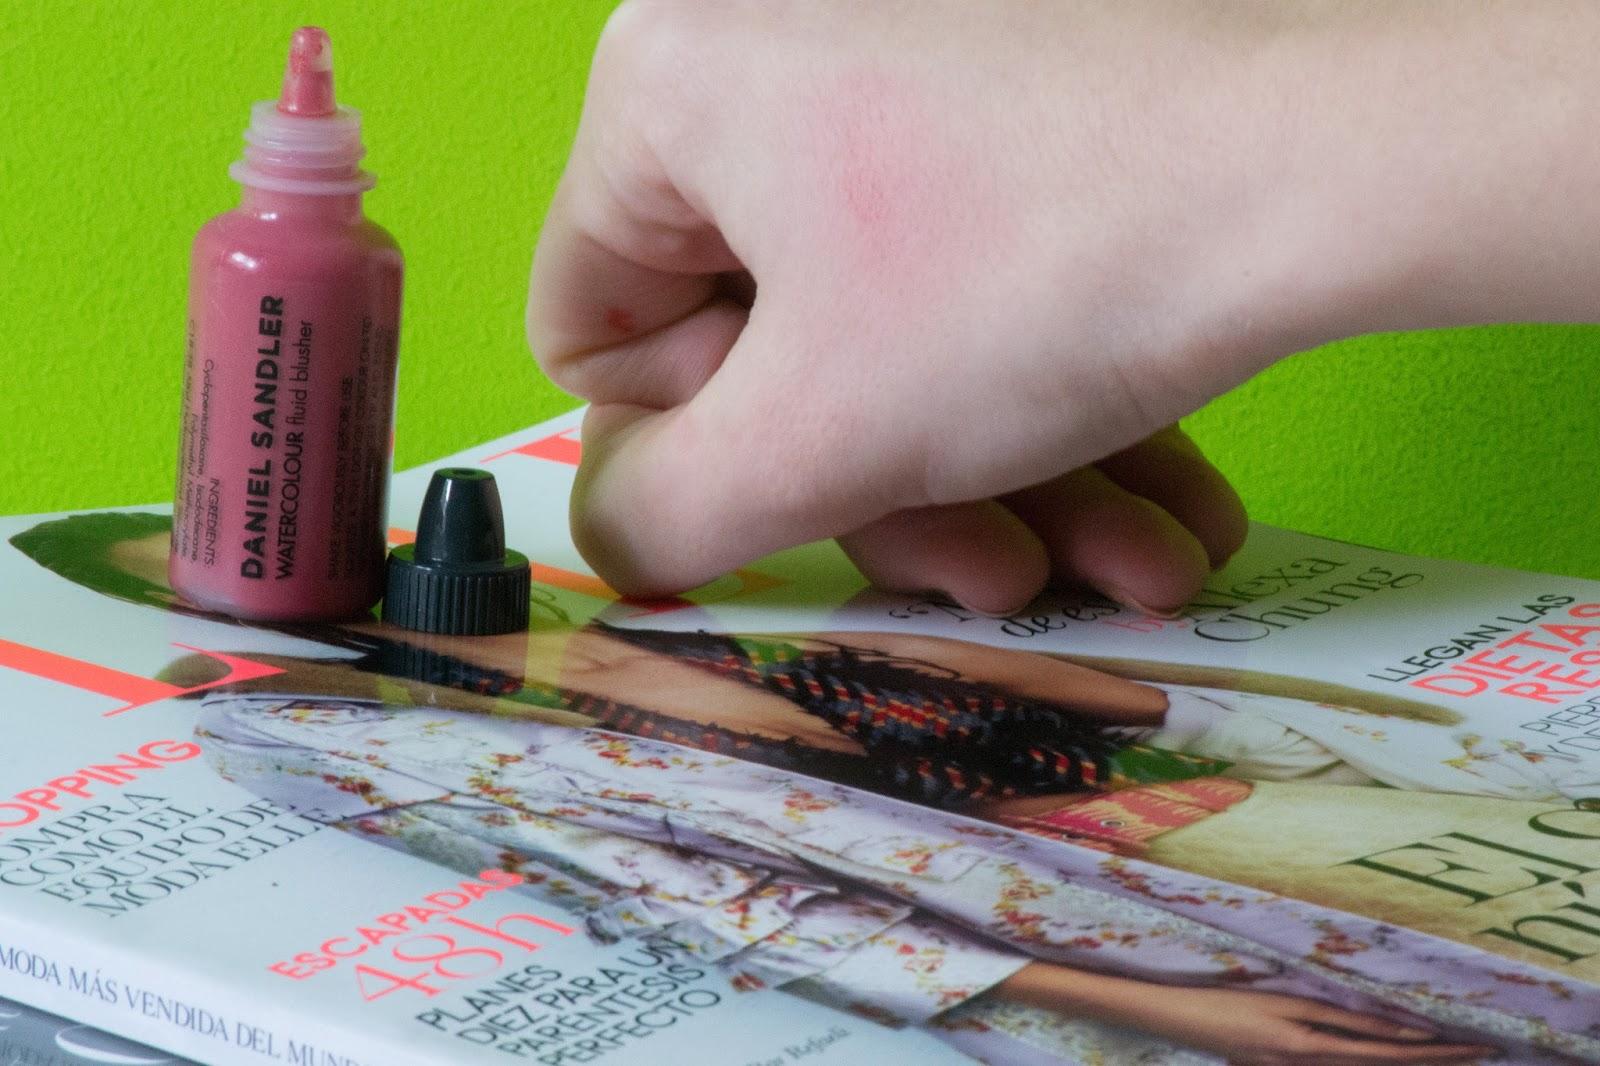 Daniel Sandler, Watercolour Fluid Blusher, Dare.